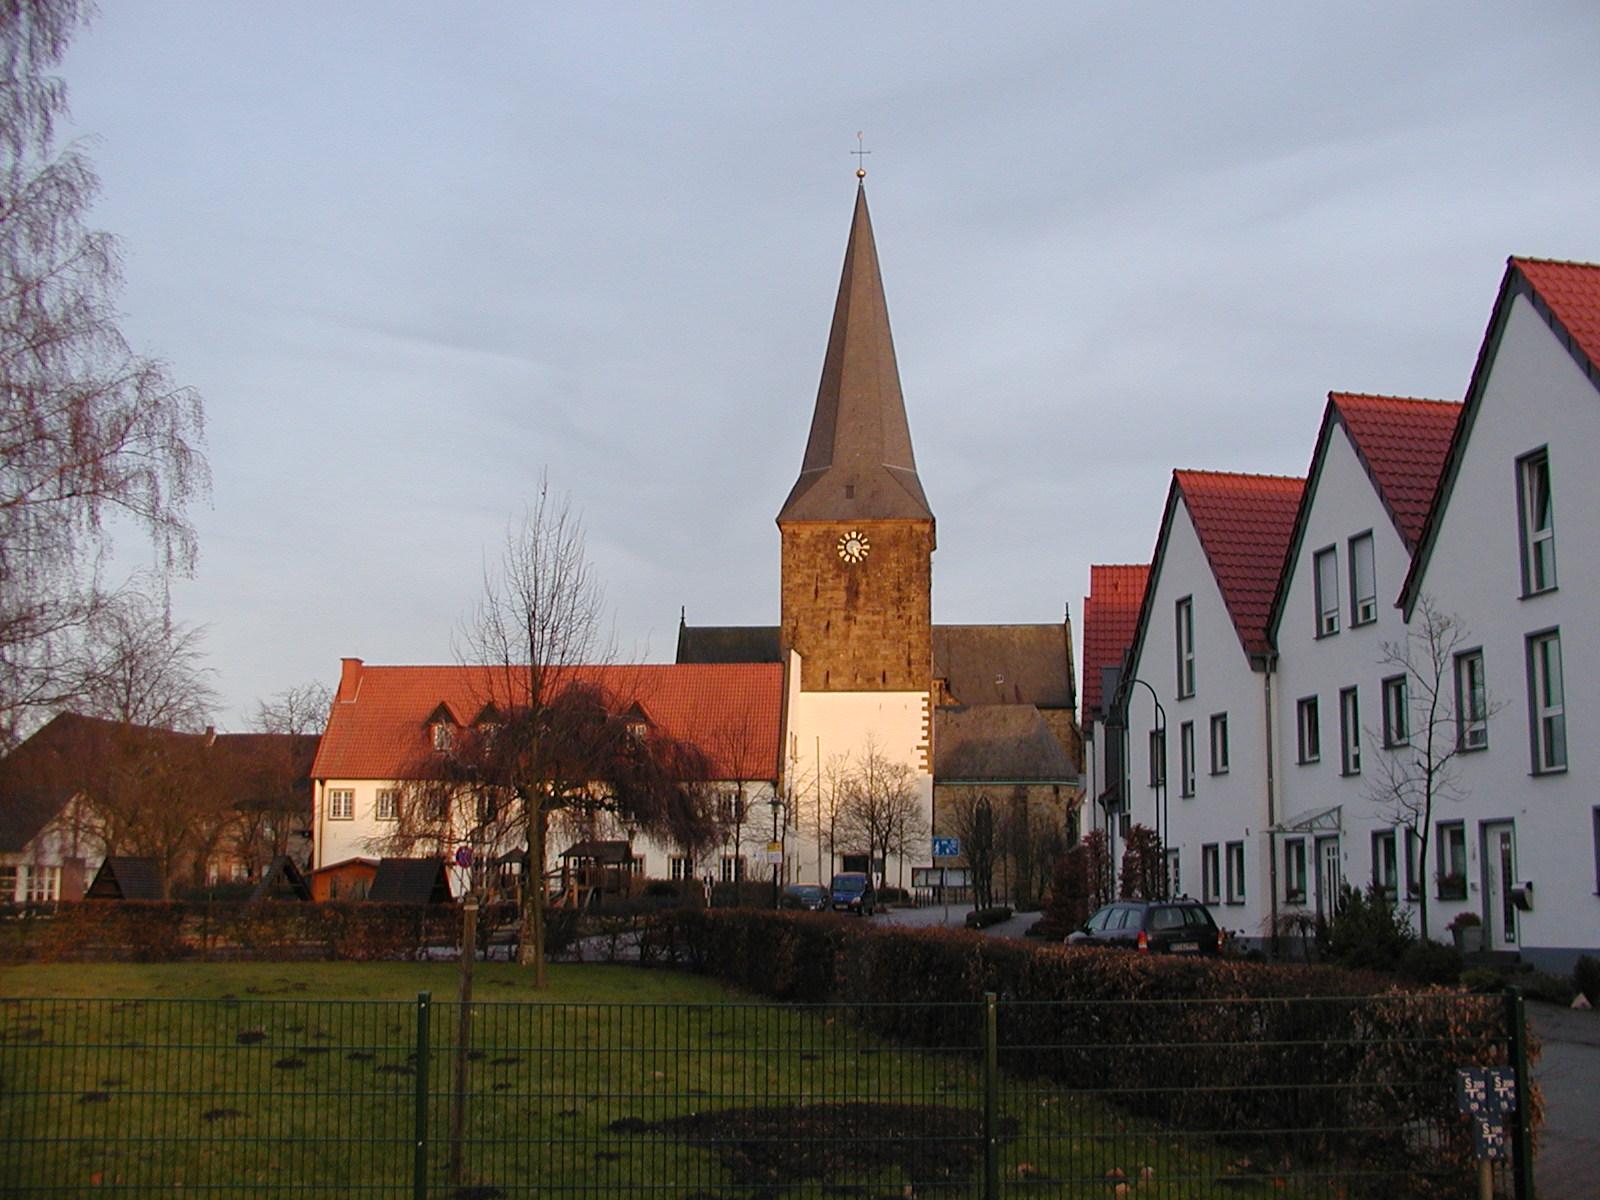 St-christina-herzebrock-2.JPG